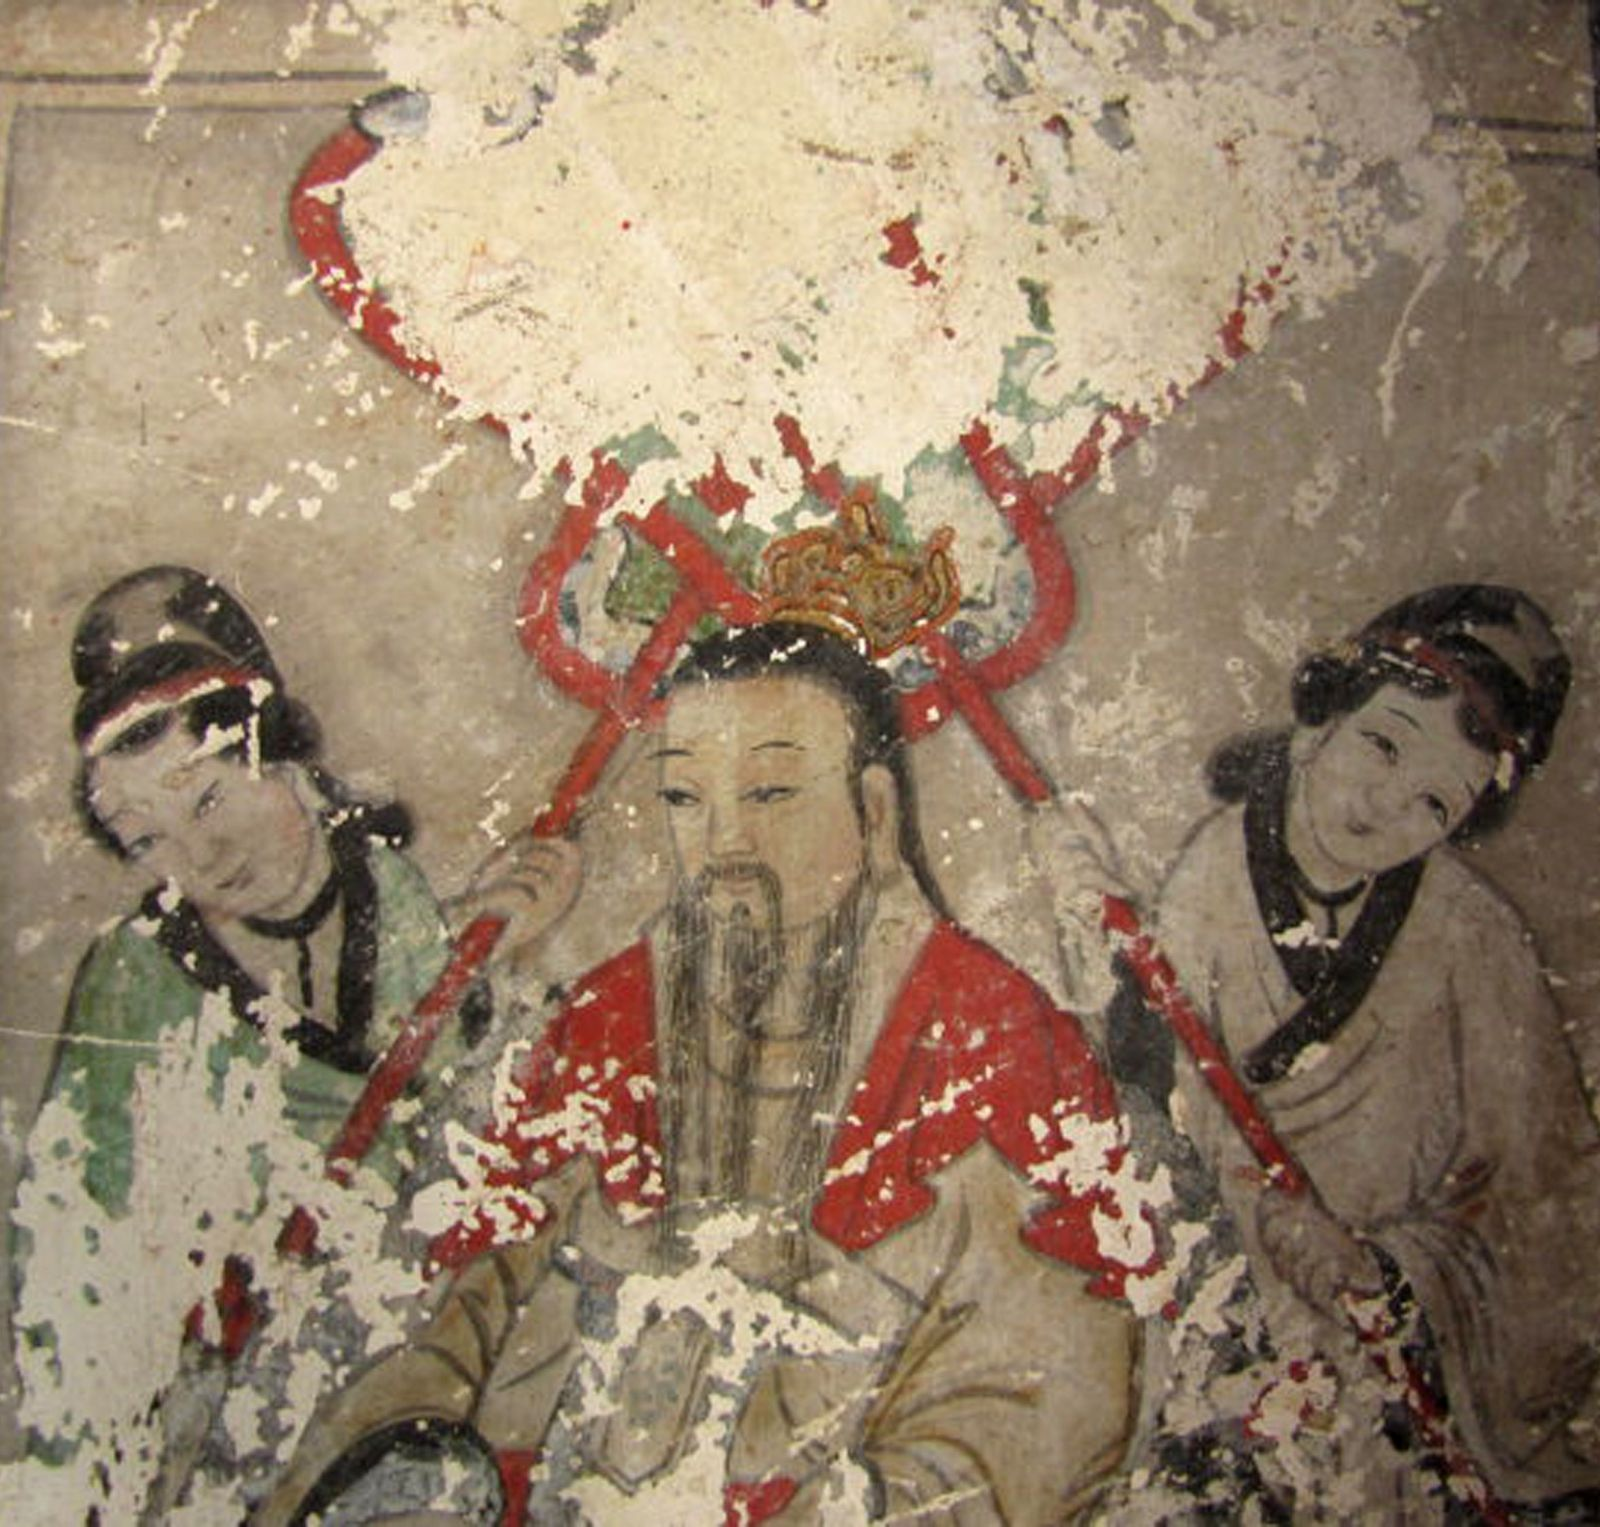 CHINA-HERITAGE-RELIGION-OFFBEAT